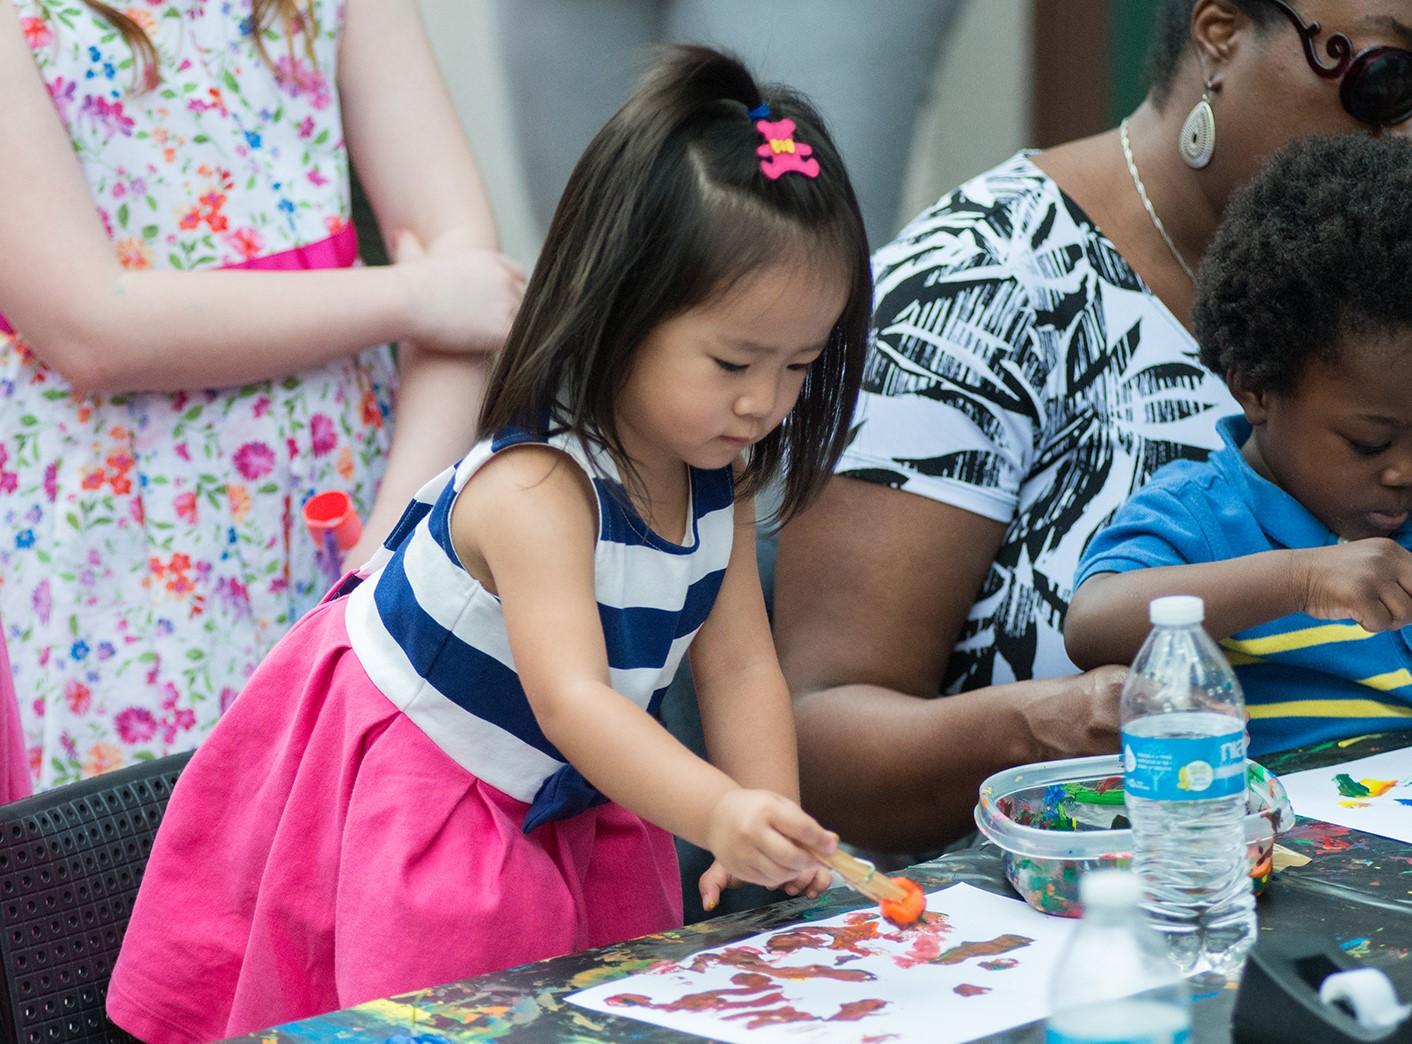 Bayou Bend Family Day - children's art-making